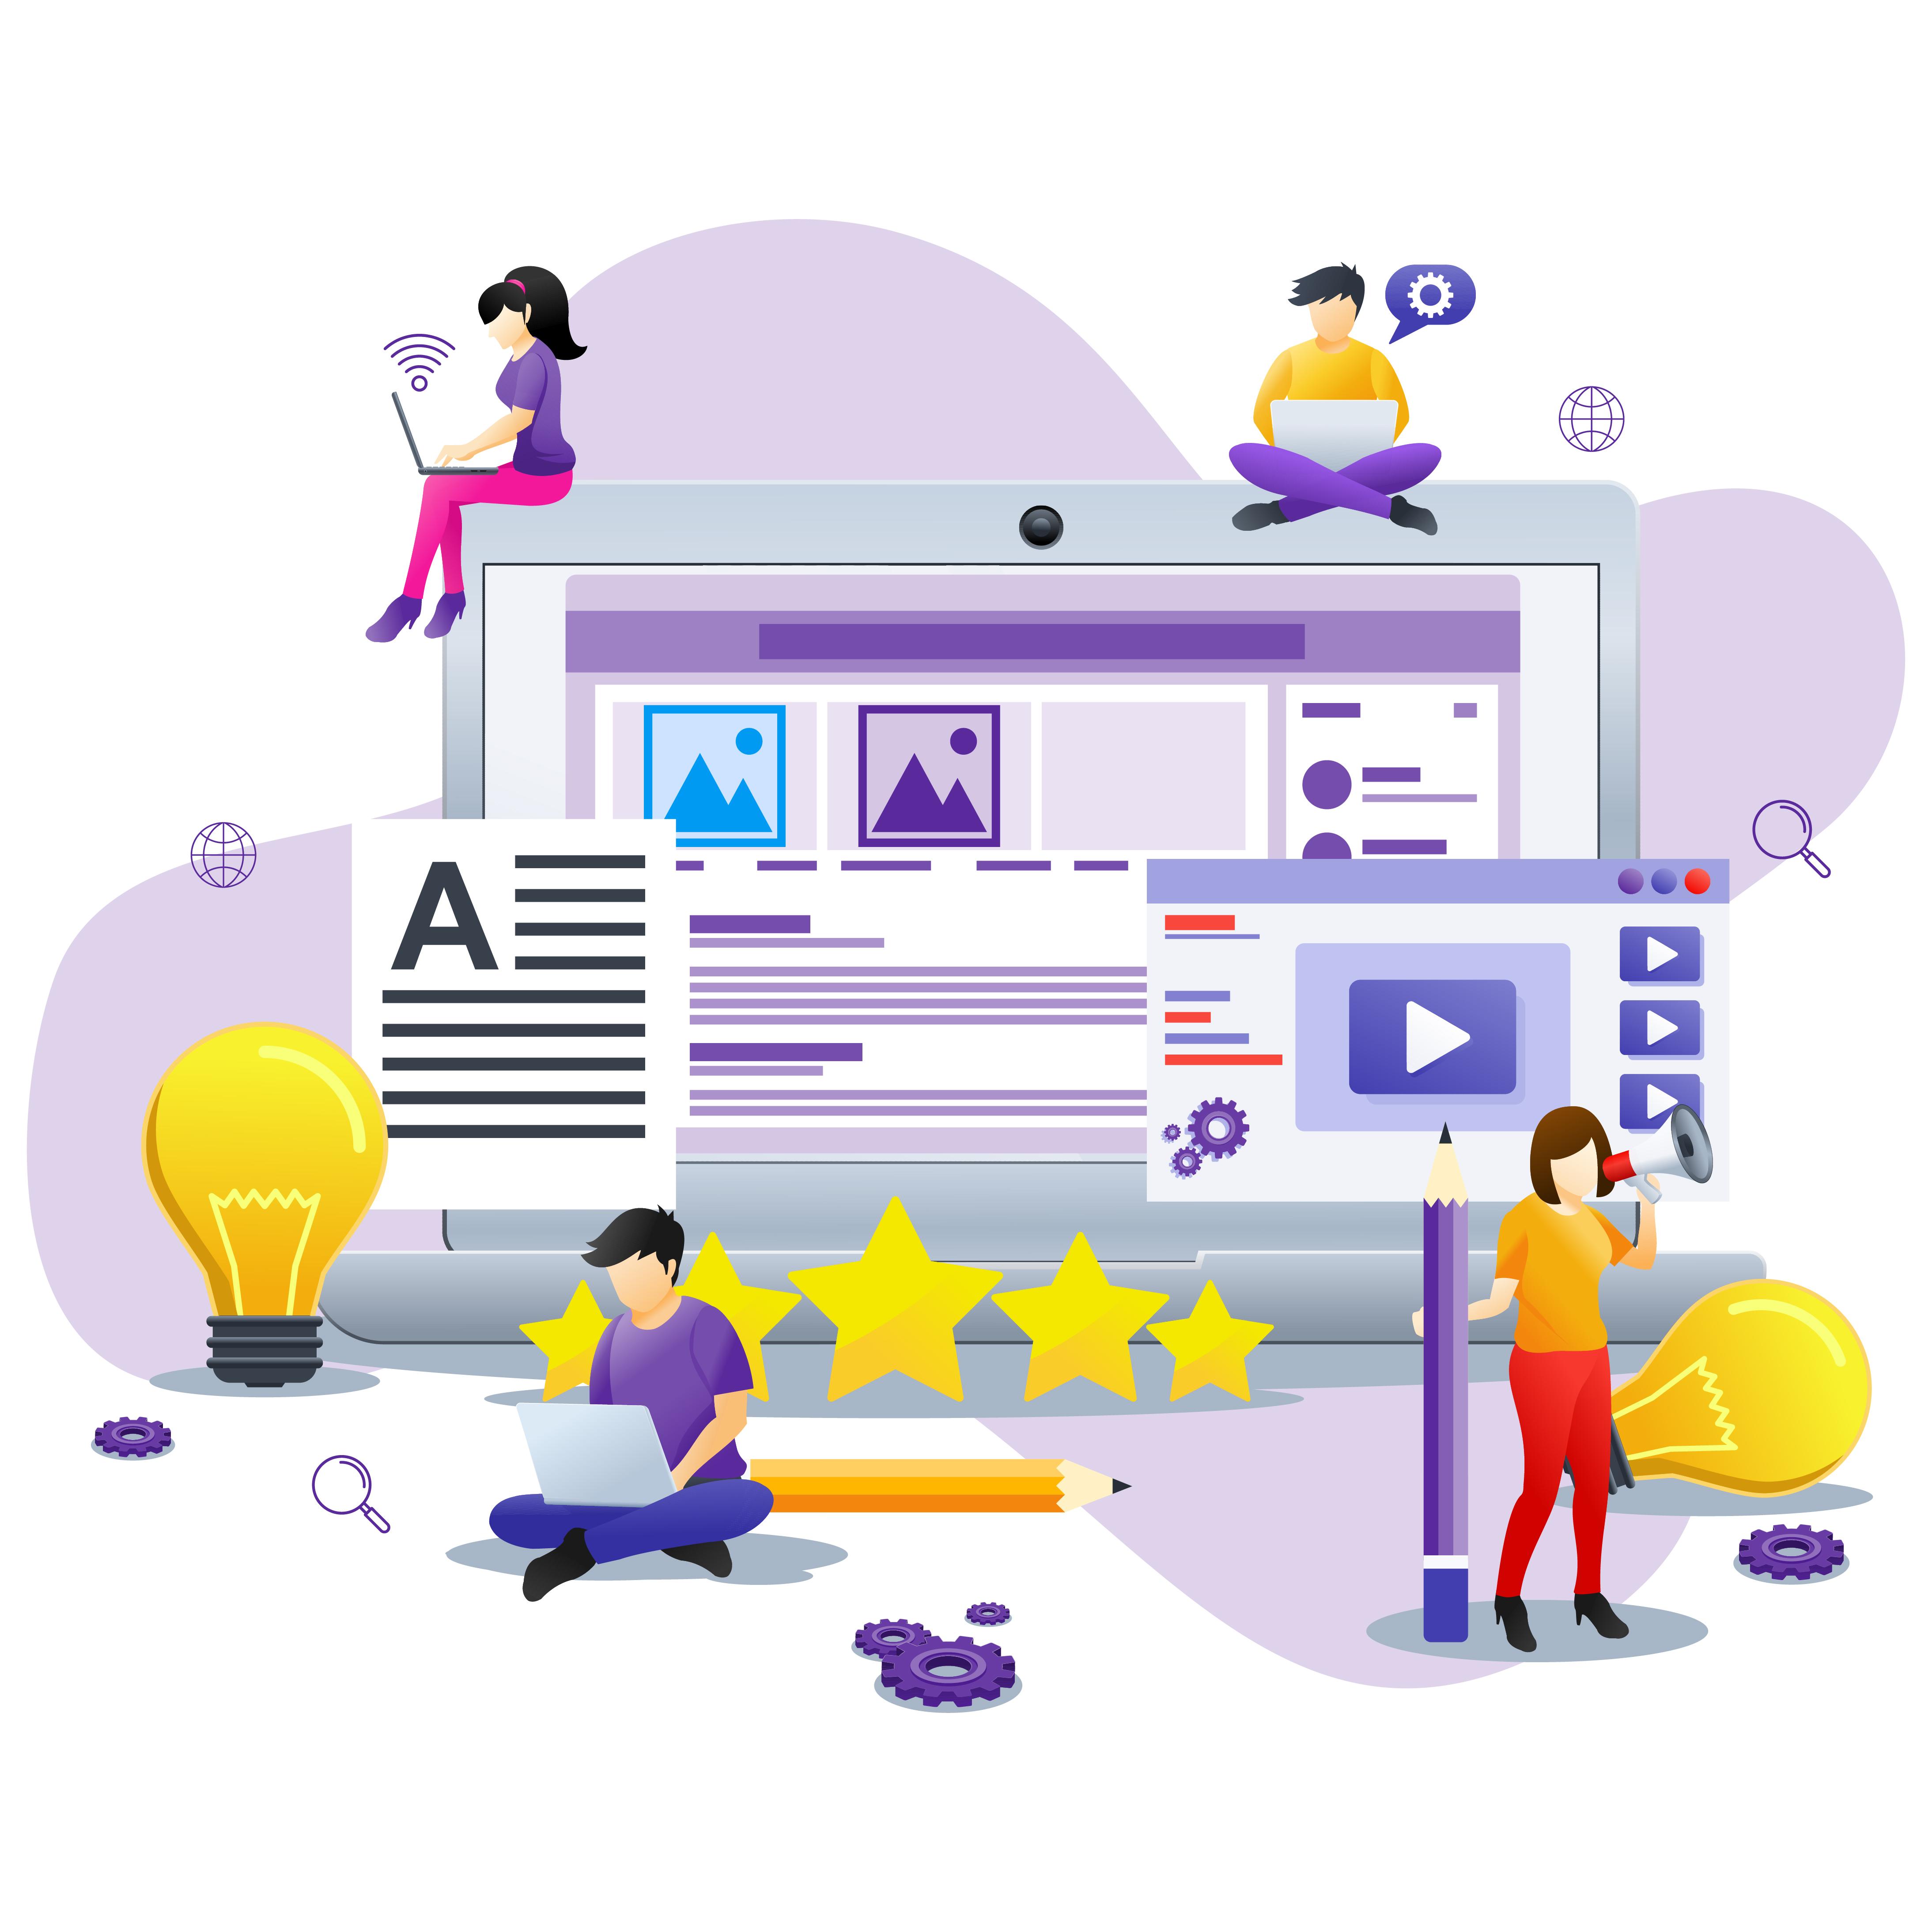 Beanstalk Growth Marketing - Online Reviews